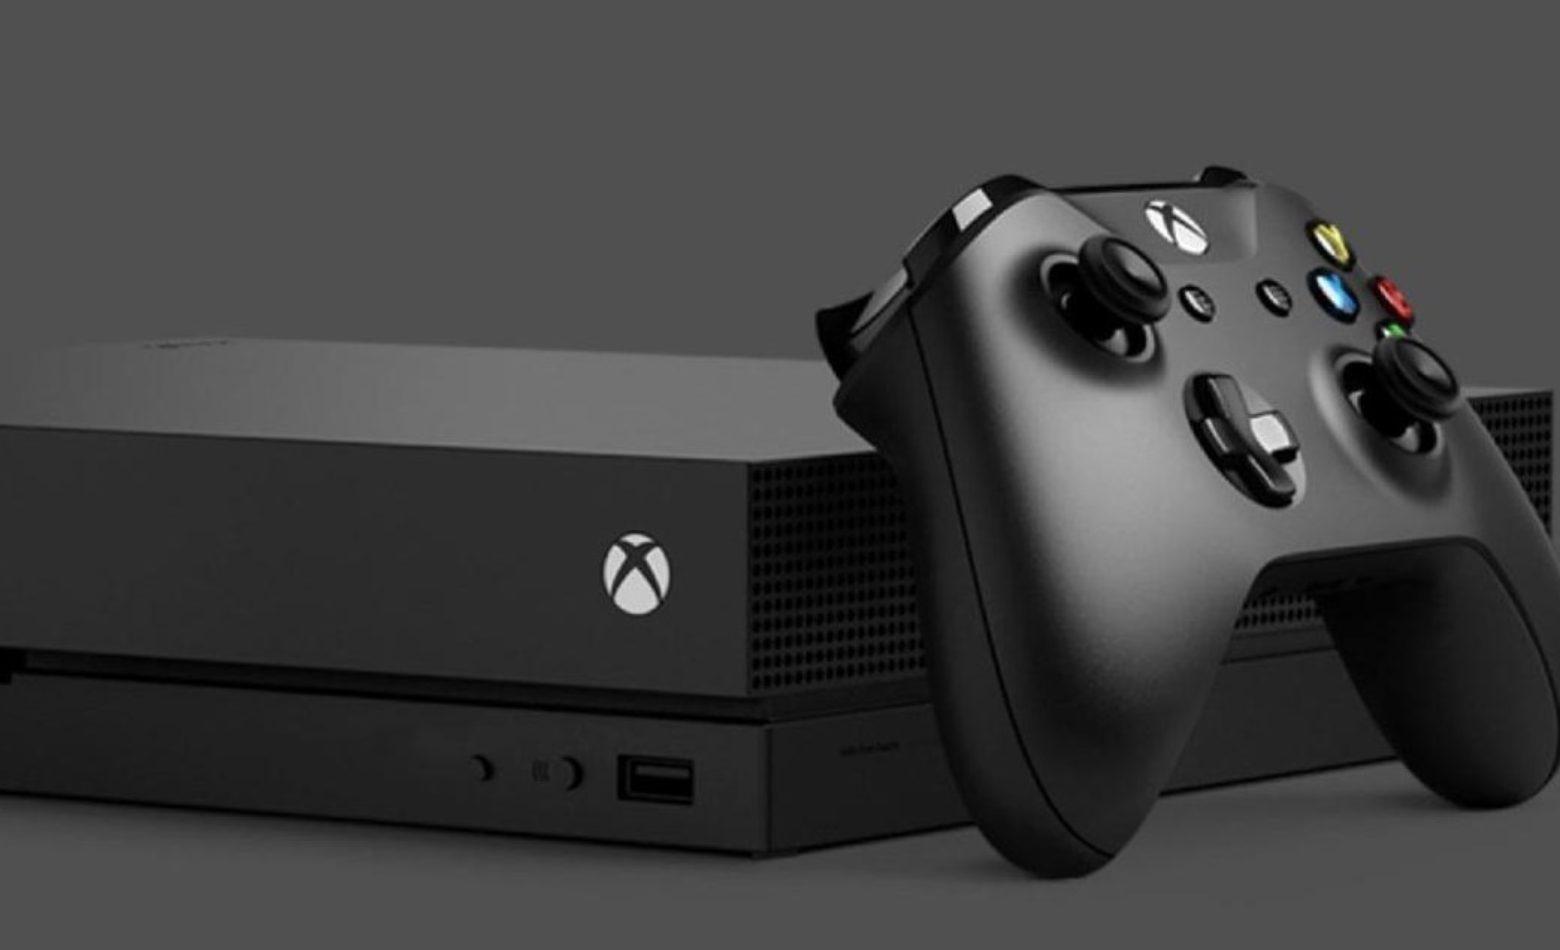 Tudo o que sabemos sobre o Xbox One X até agora